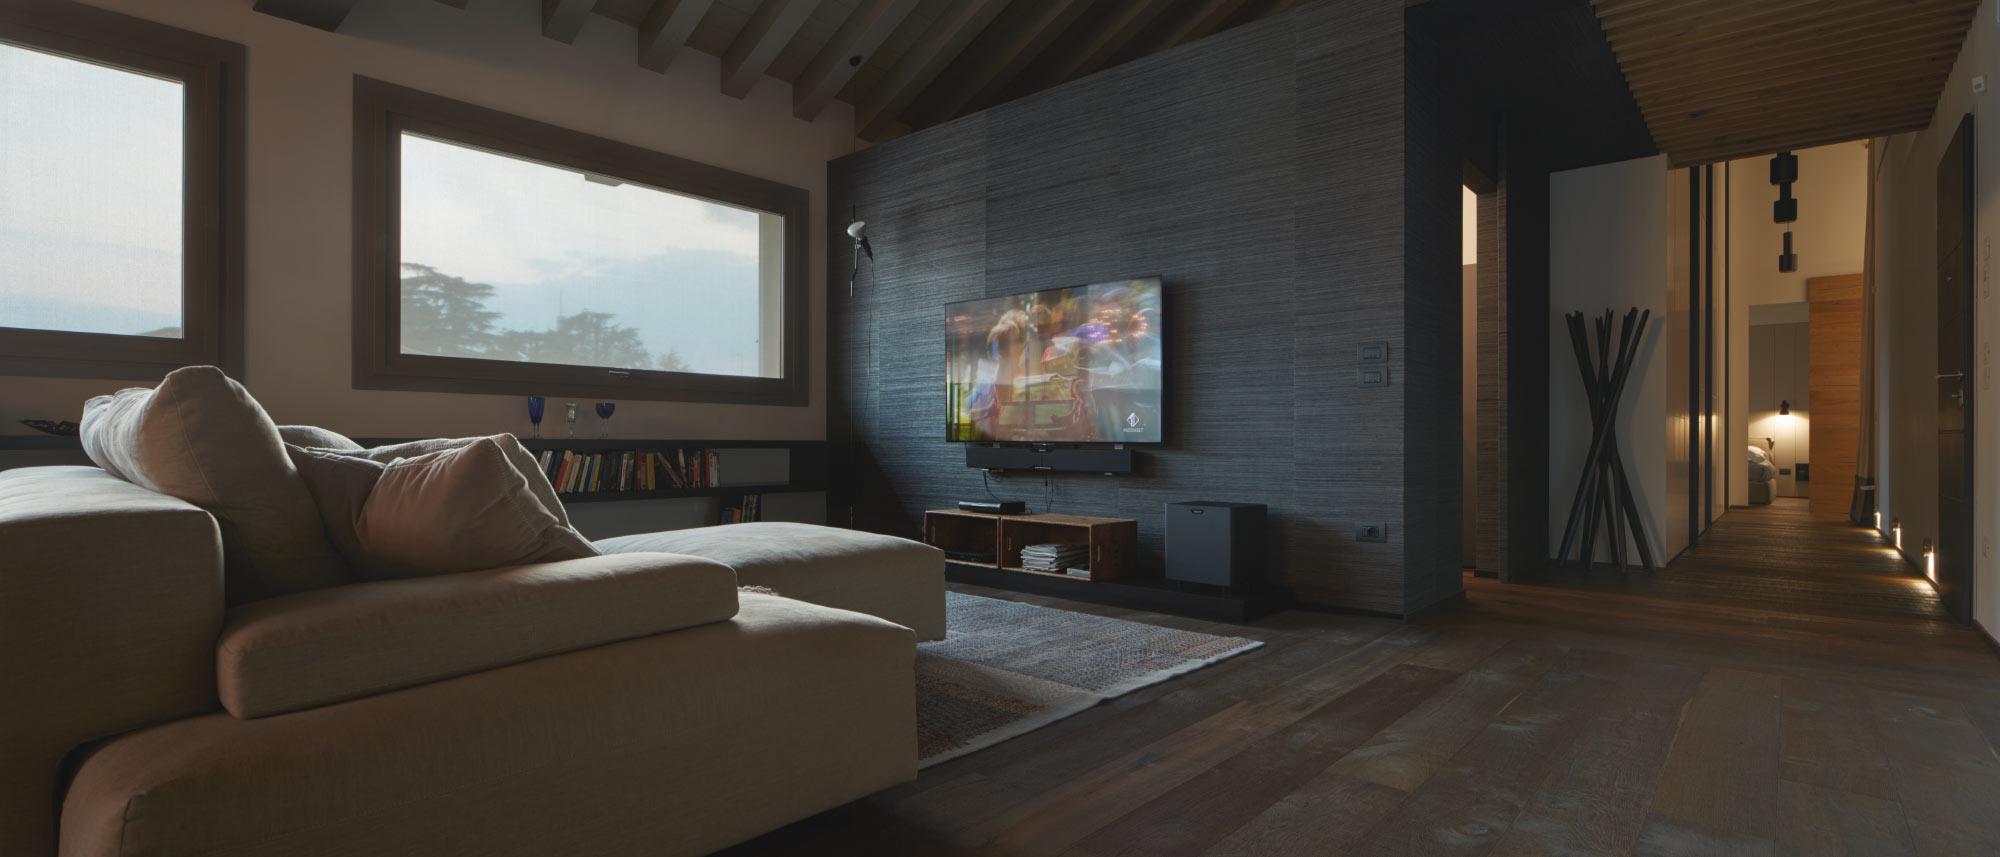 aceti_appartamento_castelfranco_59